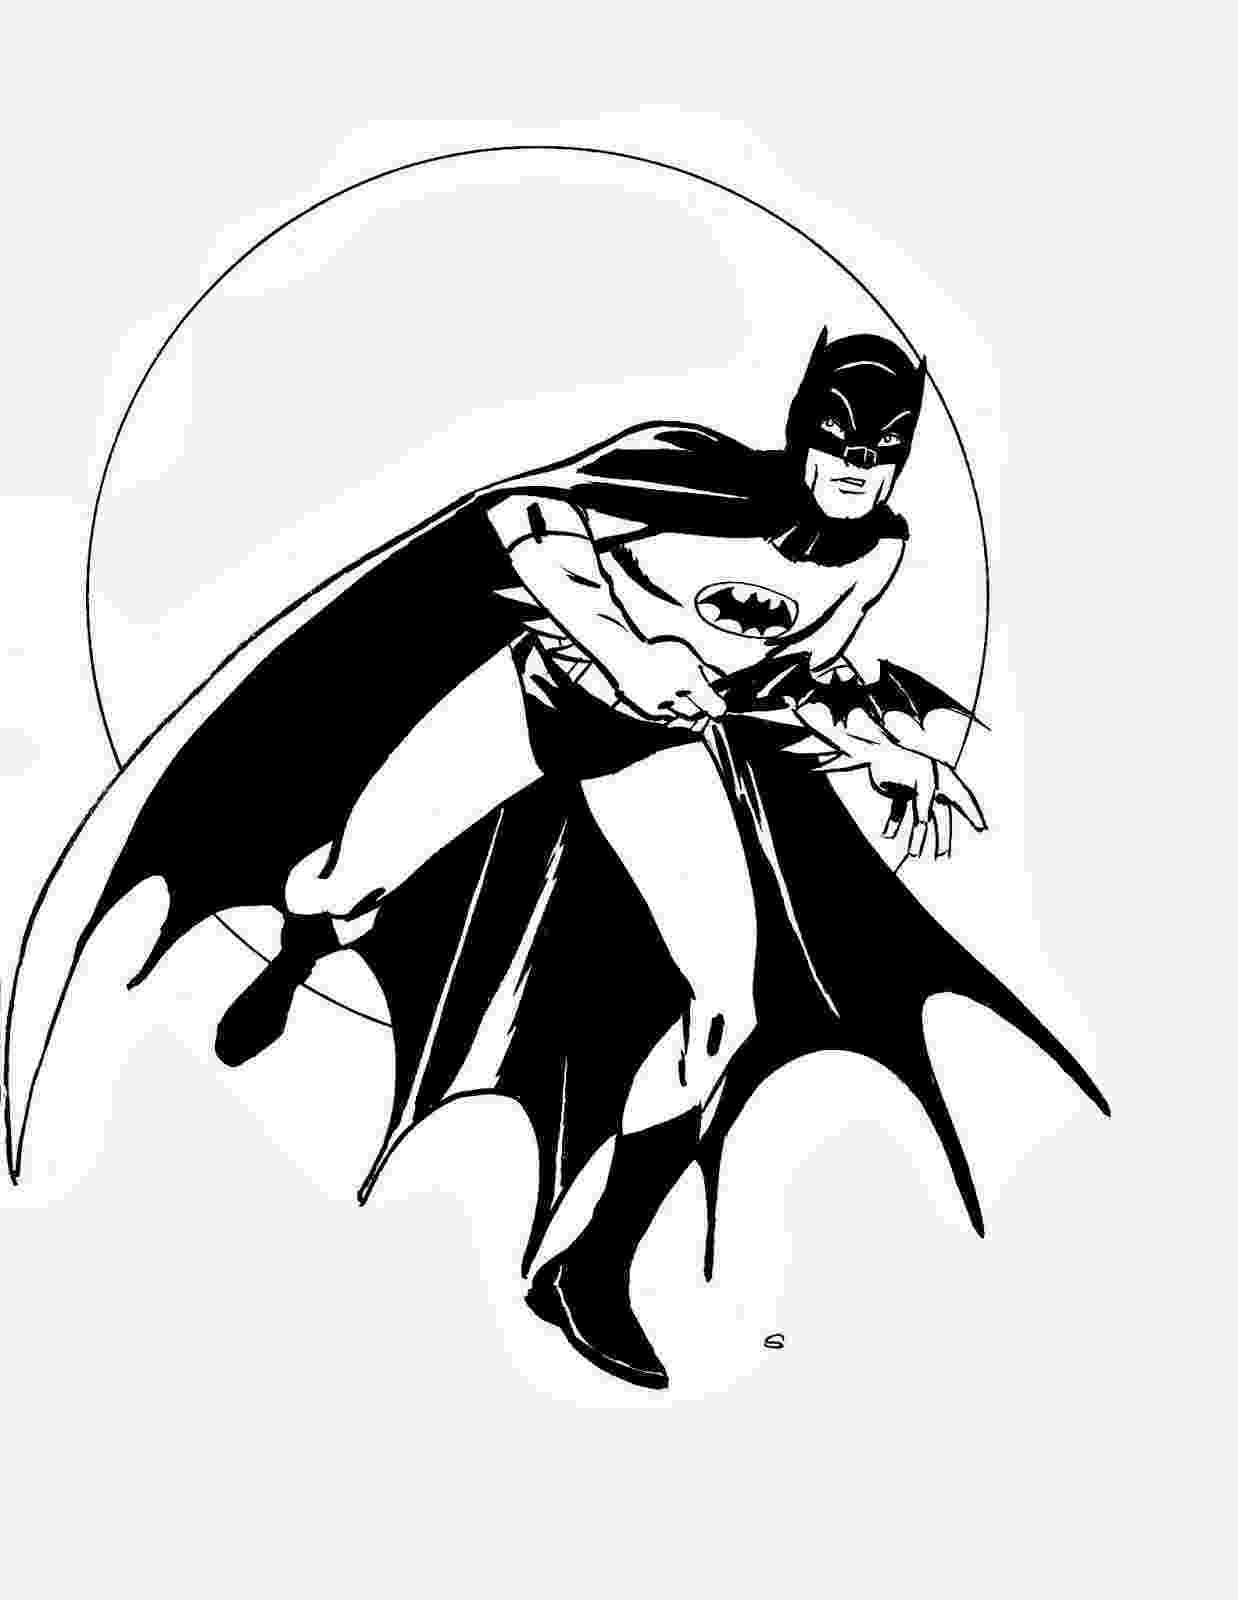 batman color pages lego batman coloring pages to download and print for free pages color batman